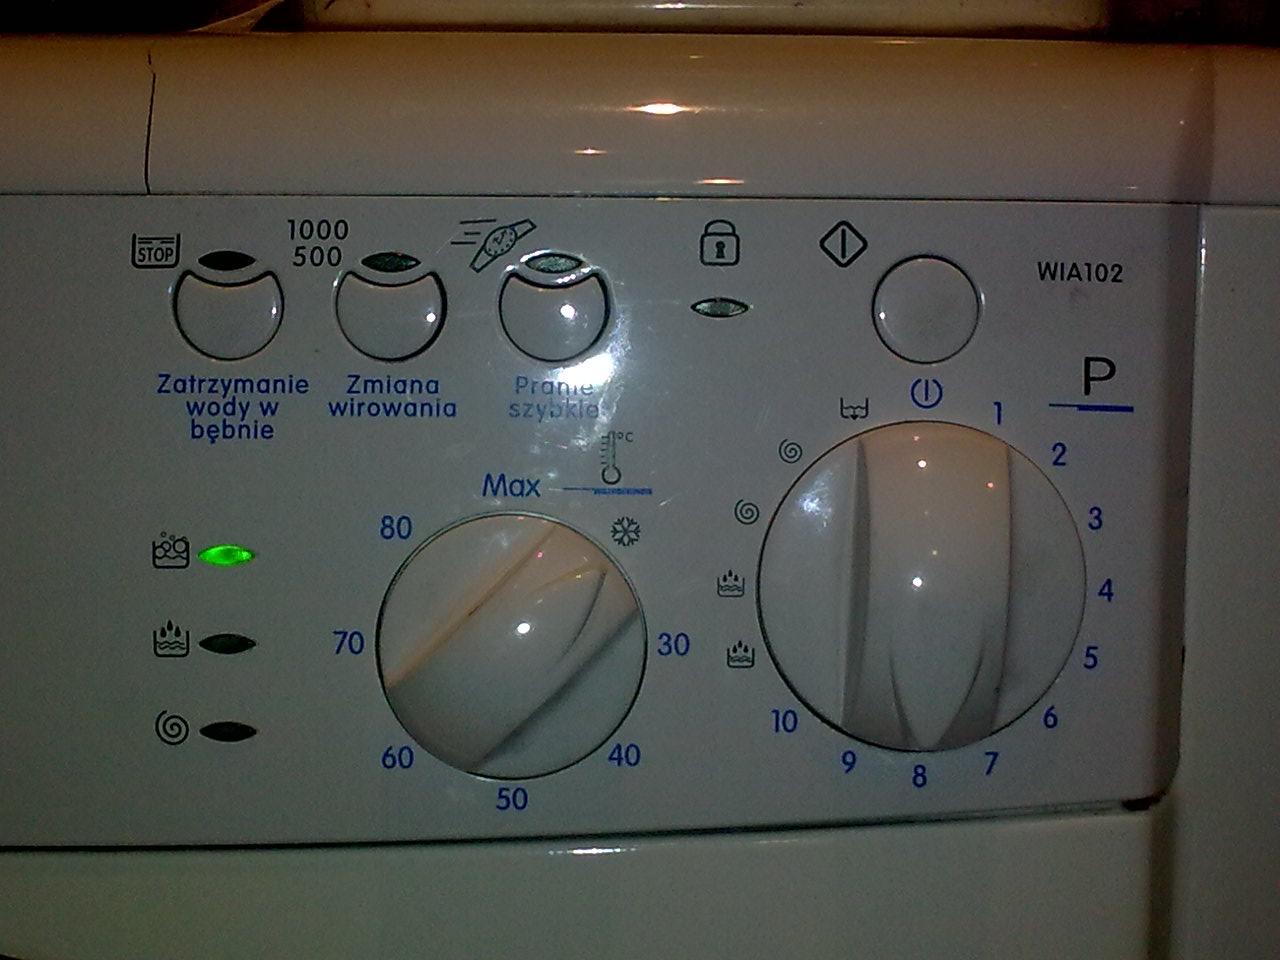 Indesit Wia 102 - �wieci lampka prania a pralka nie rusza.